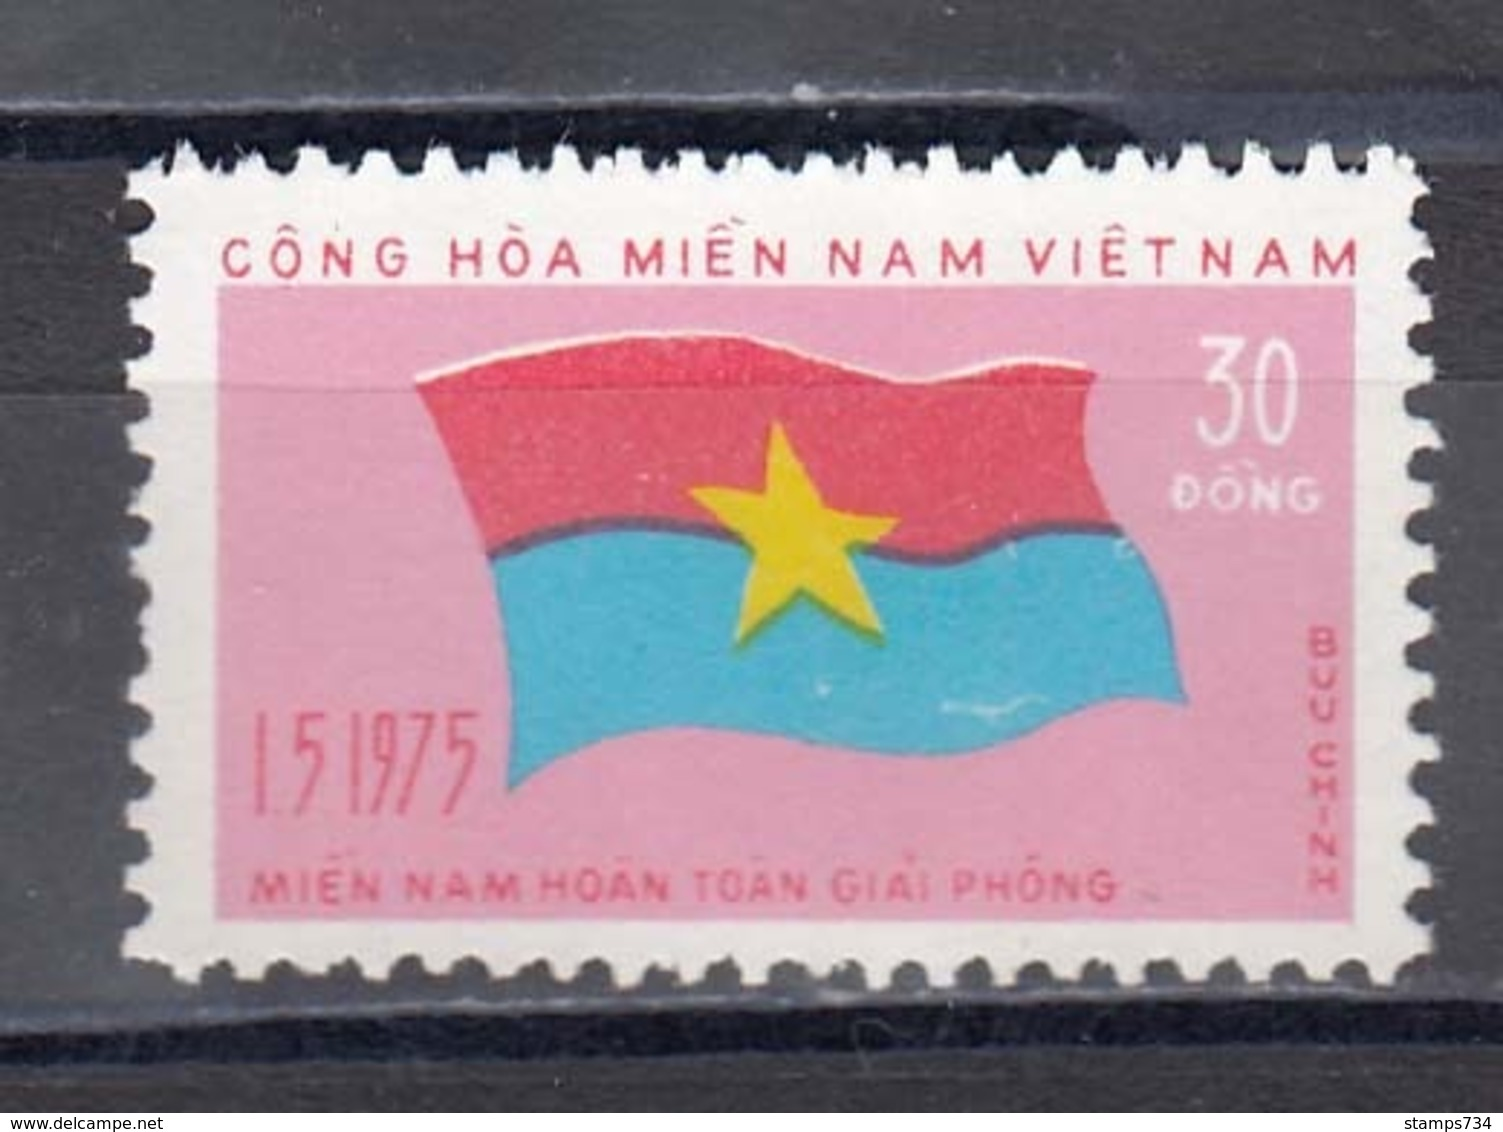 Vietnam 1976 - Edition Of The Vietcong - First Anniversary Of The Occupation Of South Vietnam, Mi-Nr.64, MNH** - Vietnam